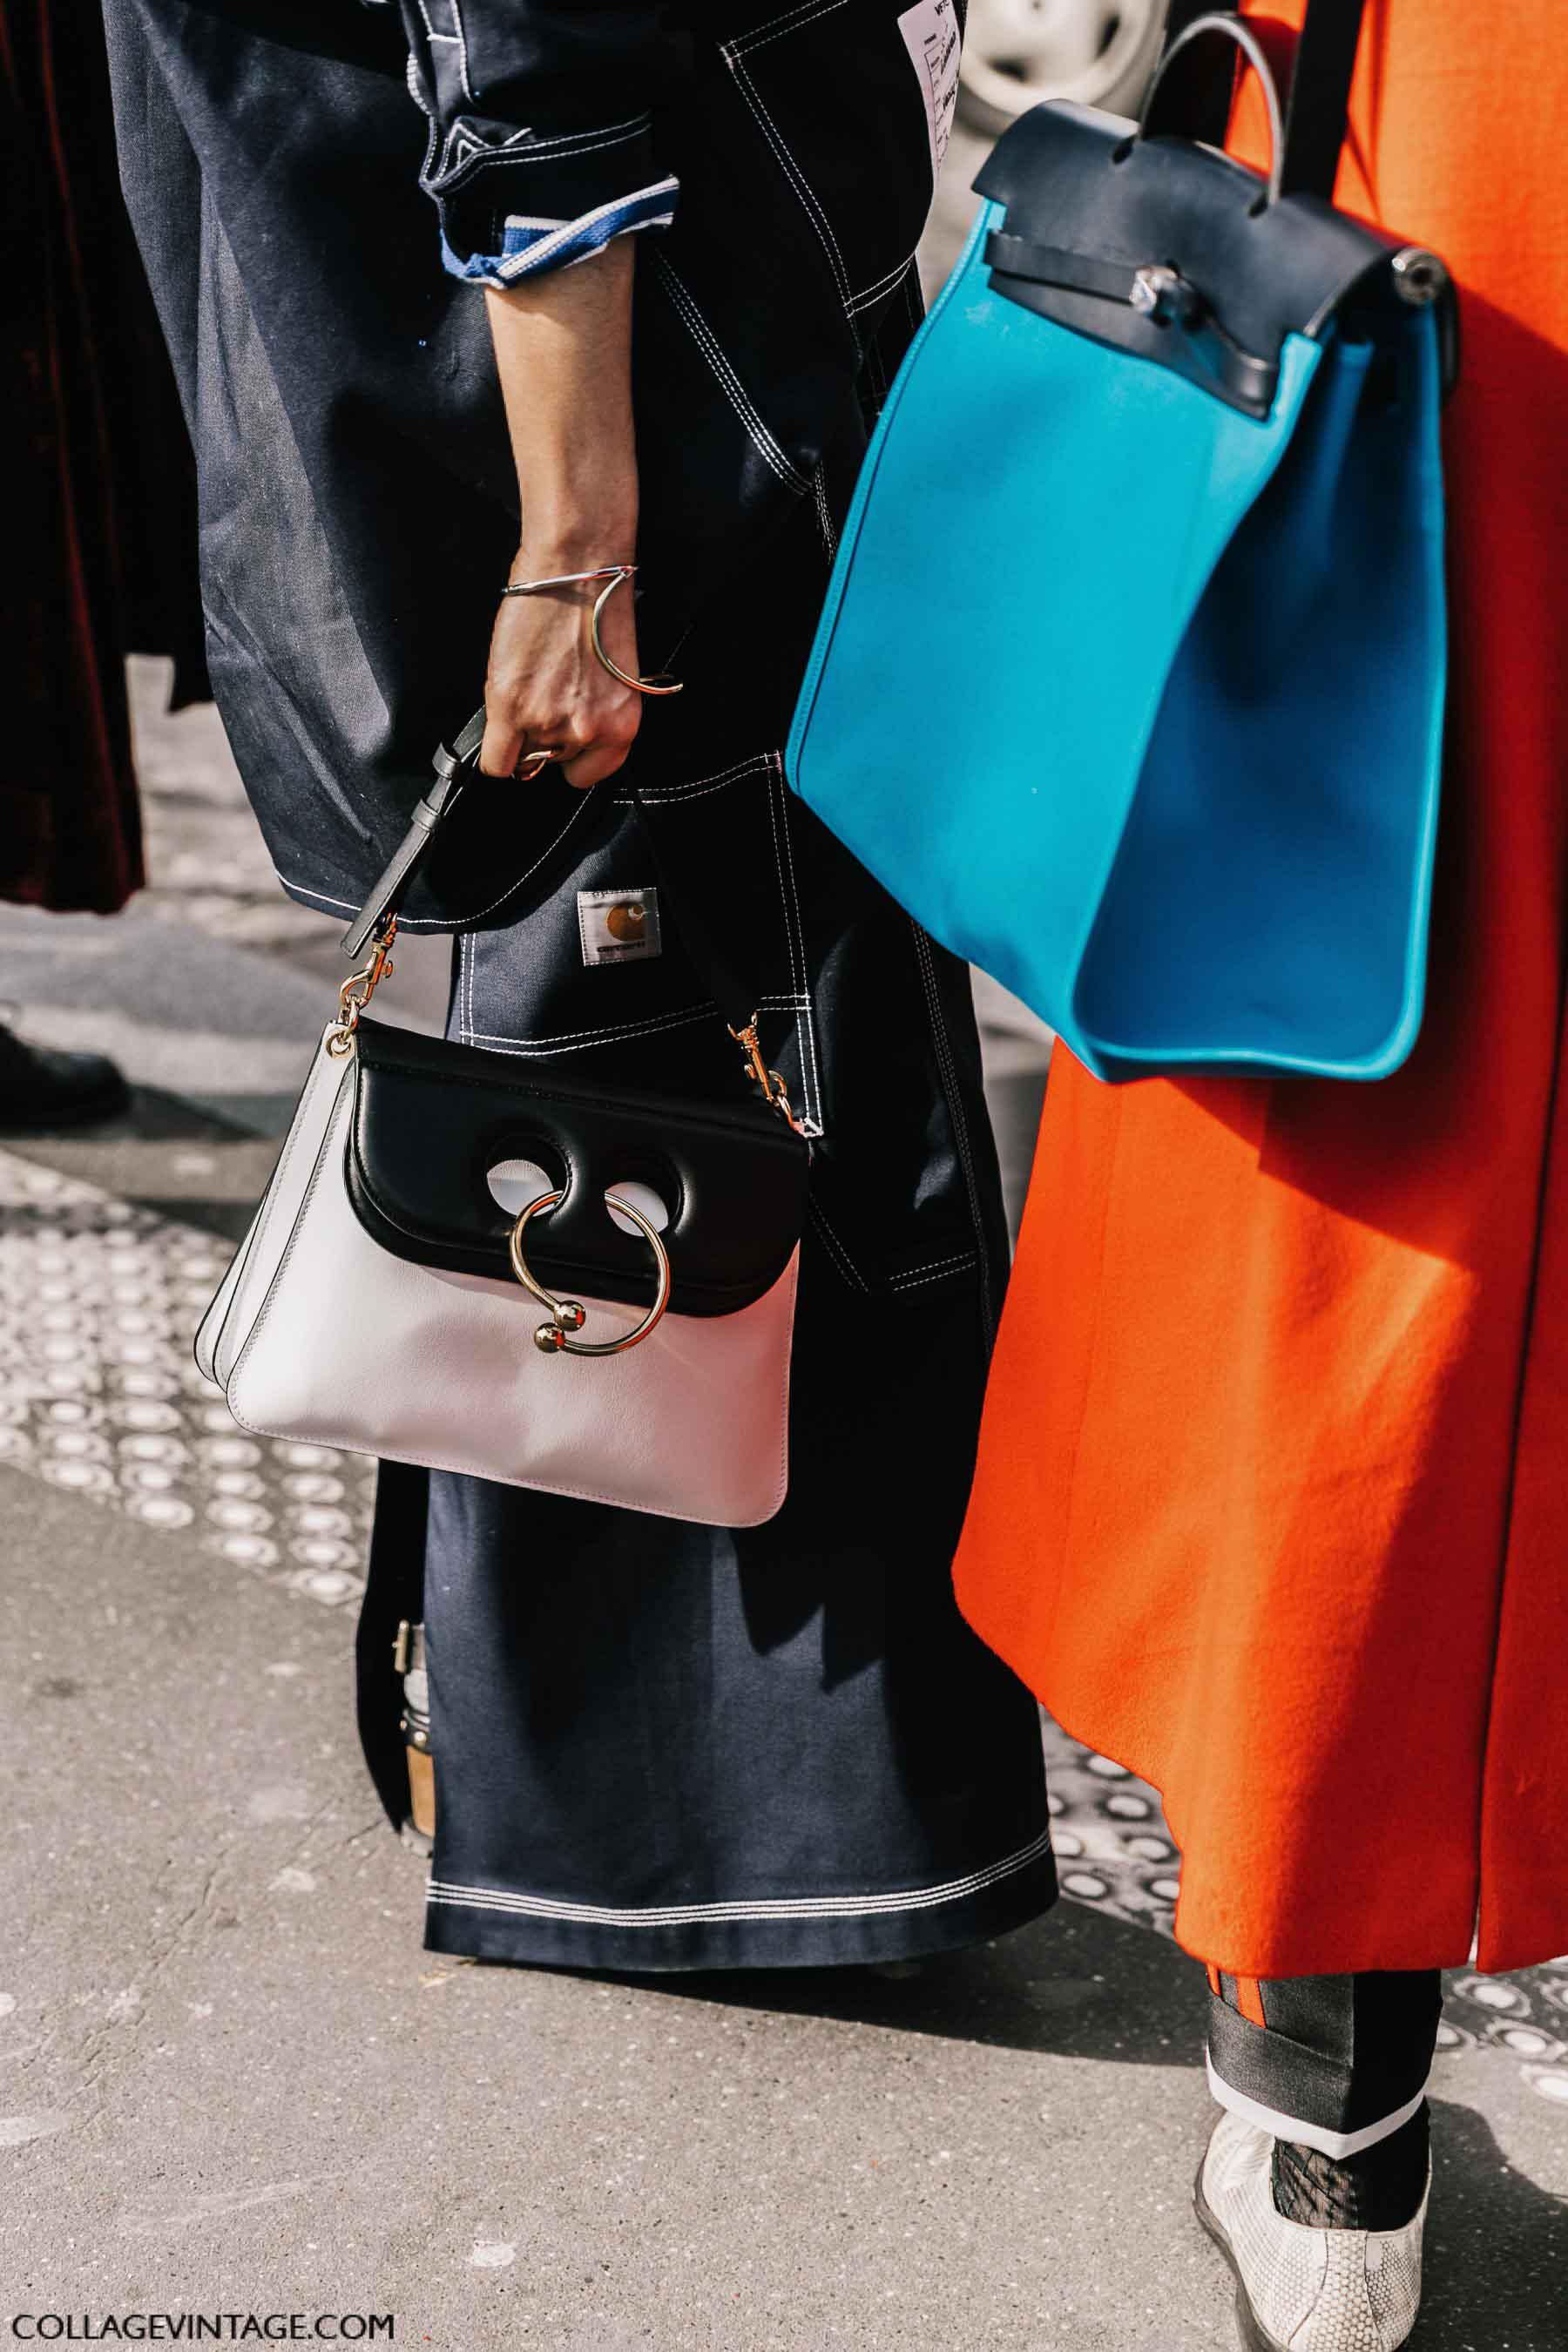 anderson bag, осень-зима 2017, парижский гардероб, parisian chic, parisian street style